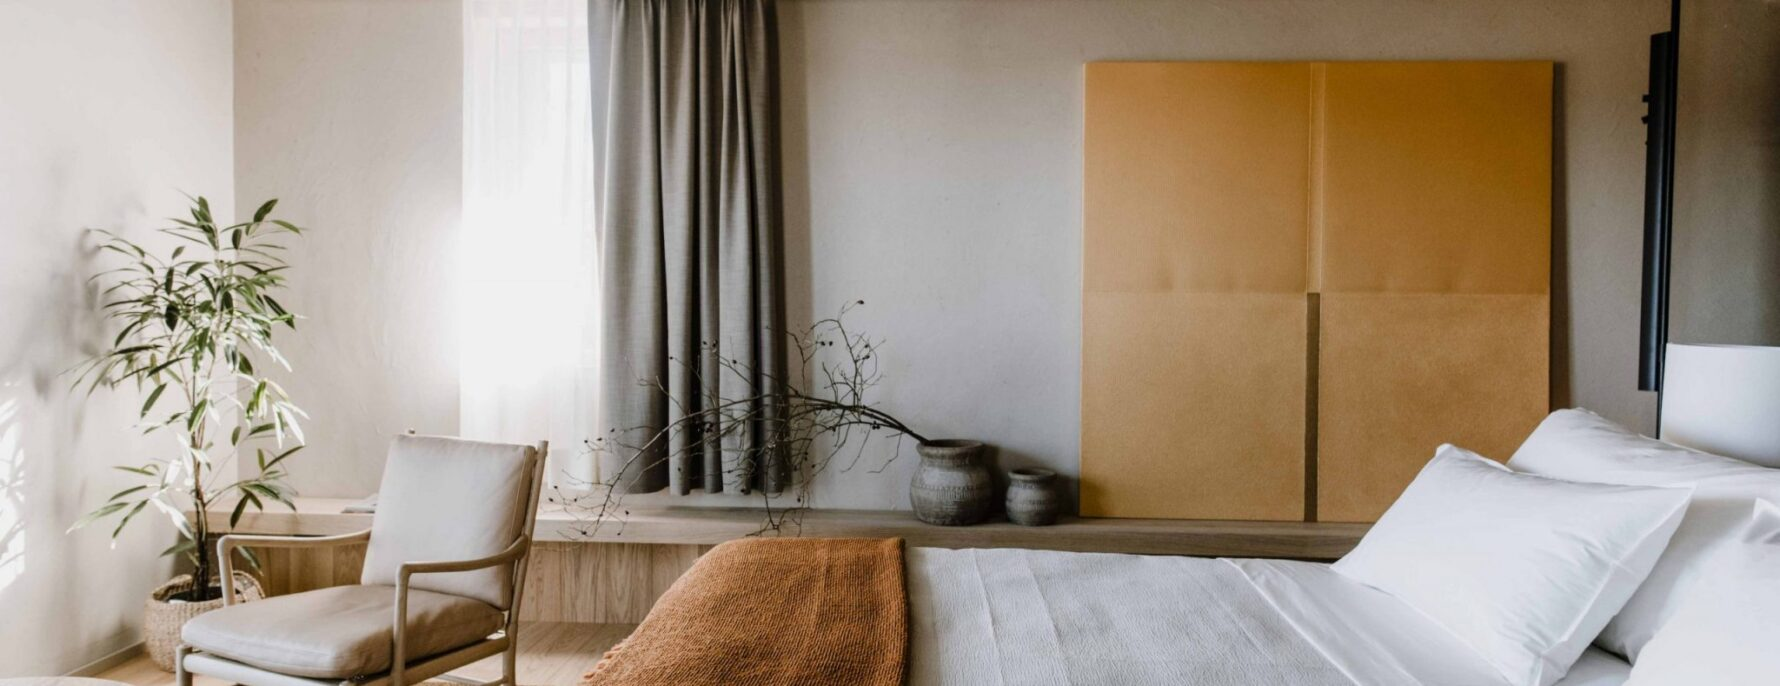 Nest Italy: Deluxe Room